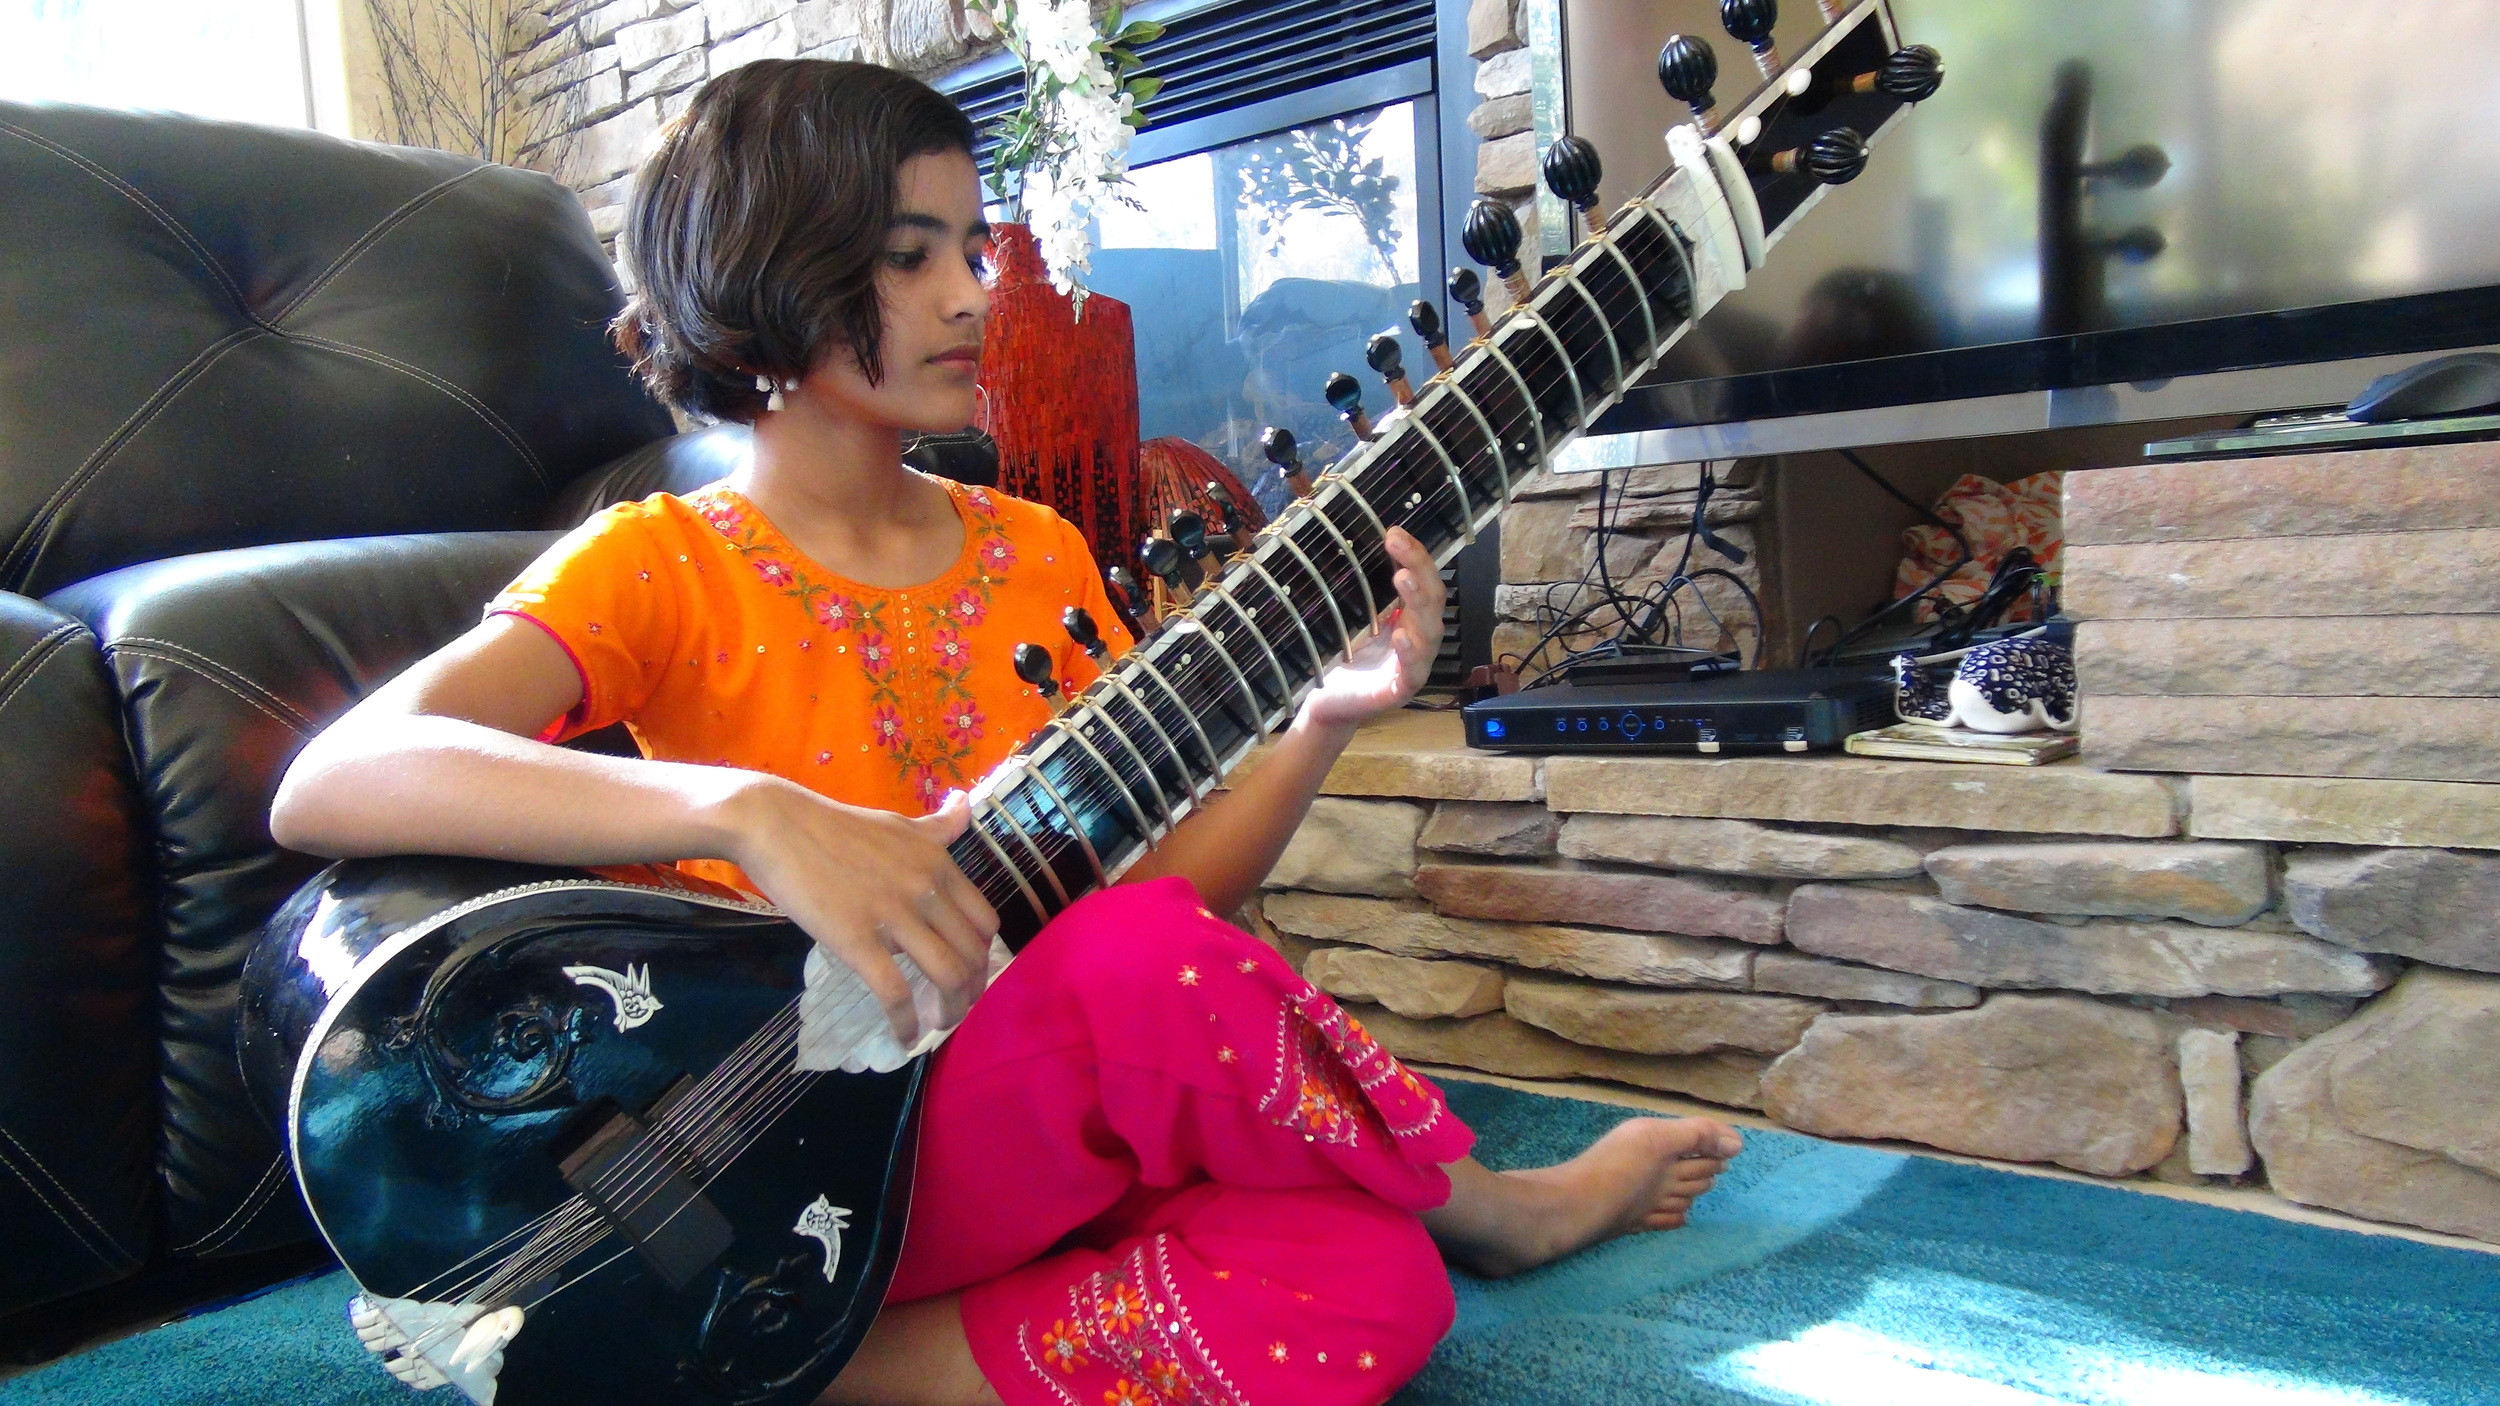 The beautiful Zahradinee practicing sitar